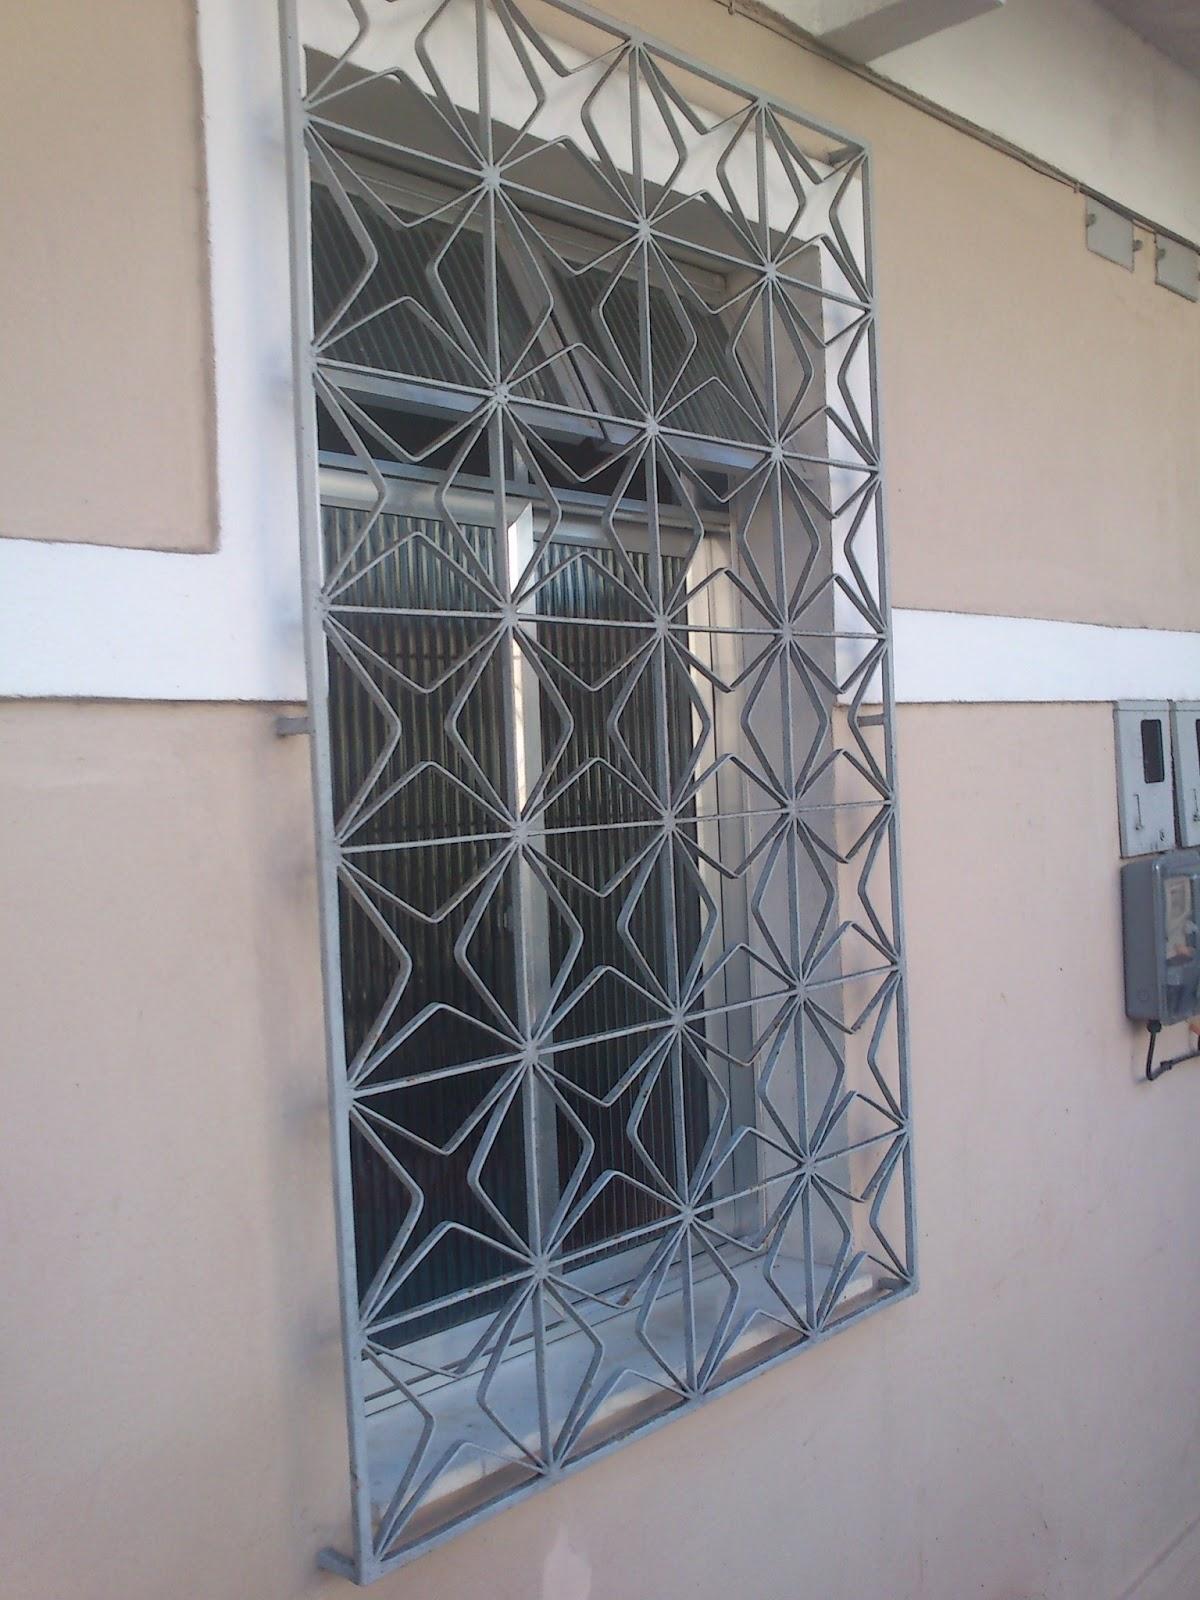 #505B67 VIDRAÇARIA ZONA NORTE RJ: Grades Serralheria Zona Norte Rj  1002 Portas E Janelas De Aluminio Baratas No Rj